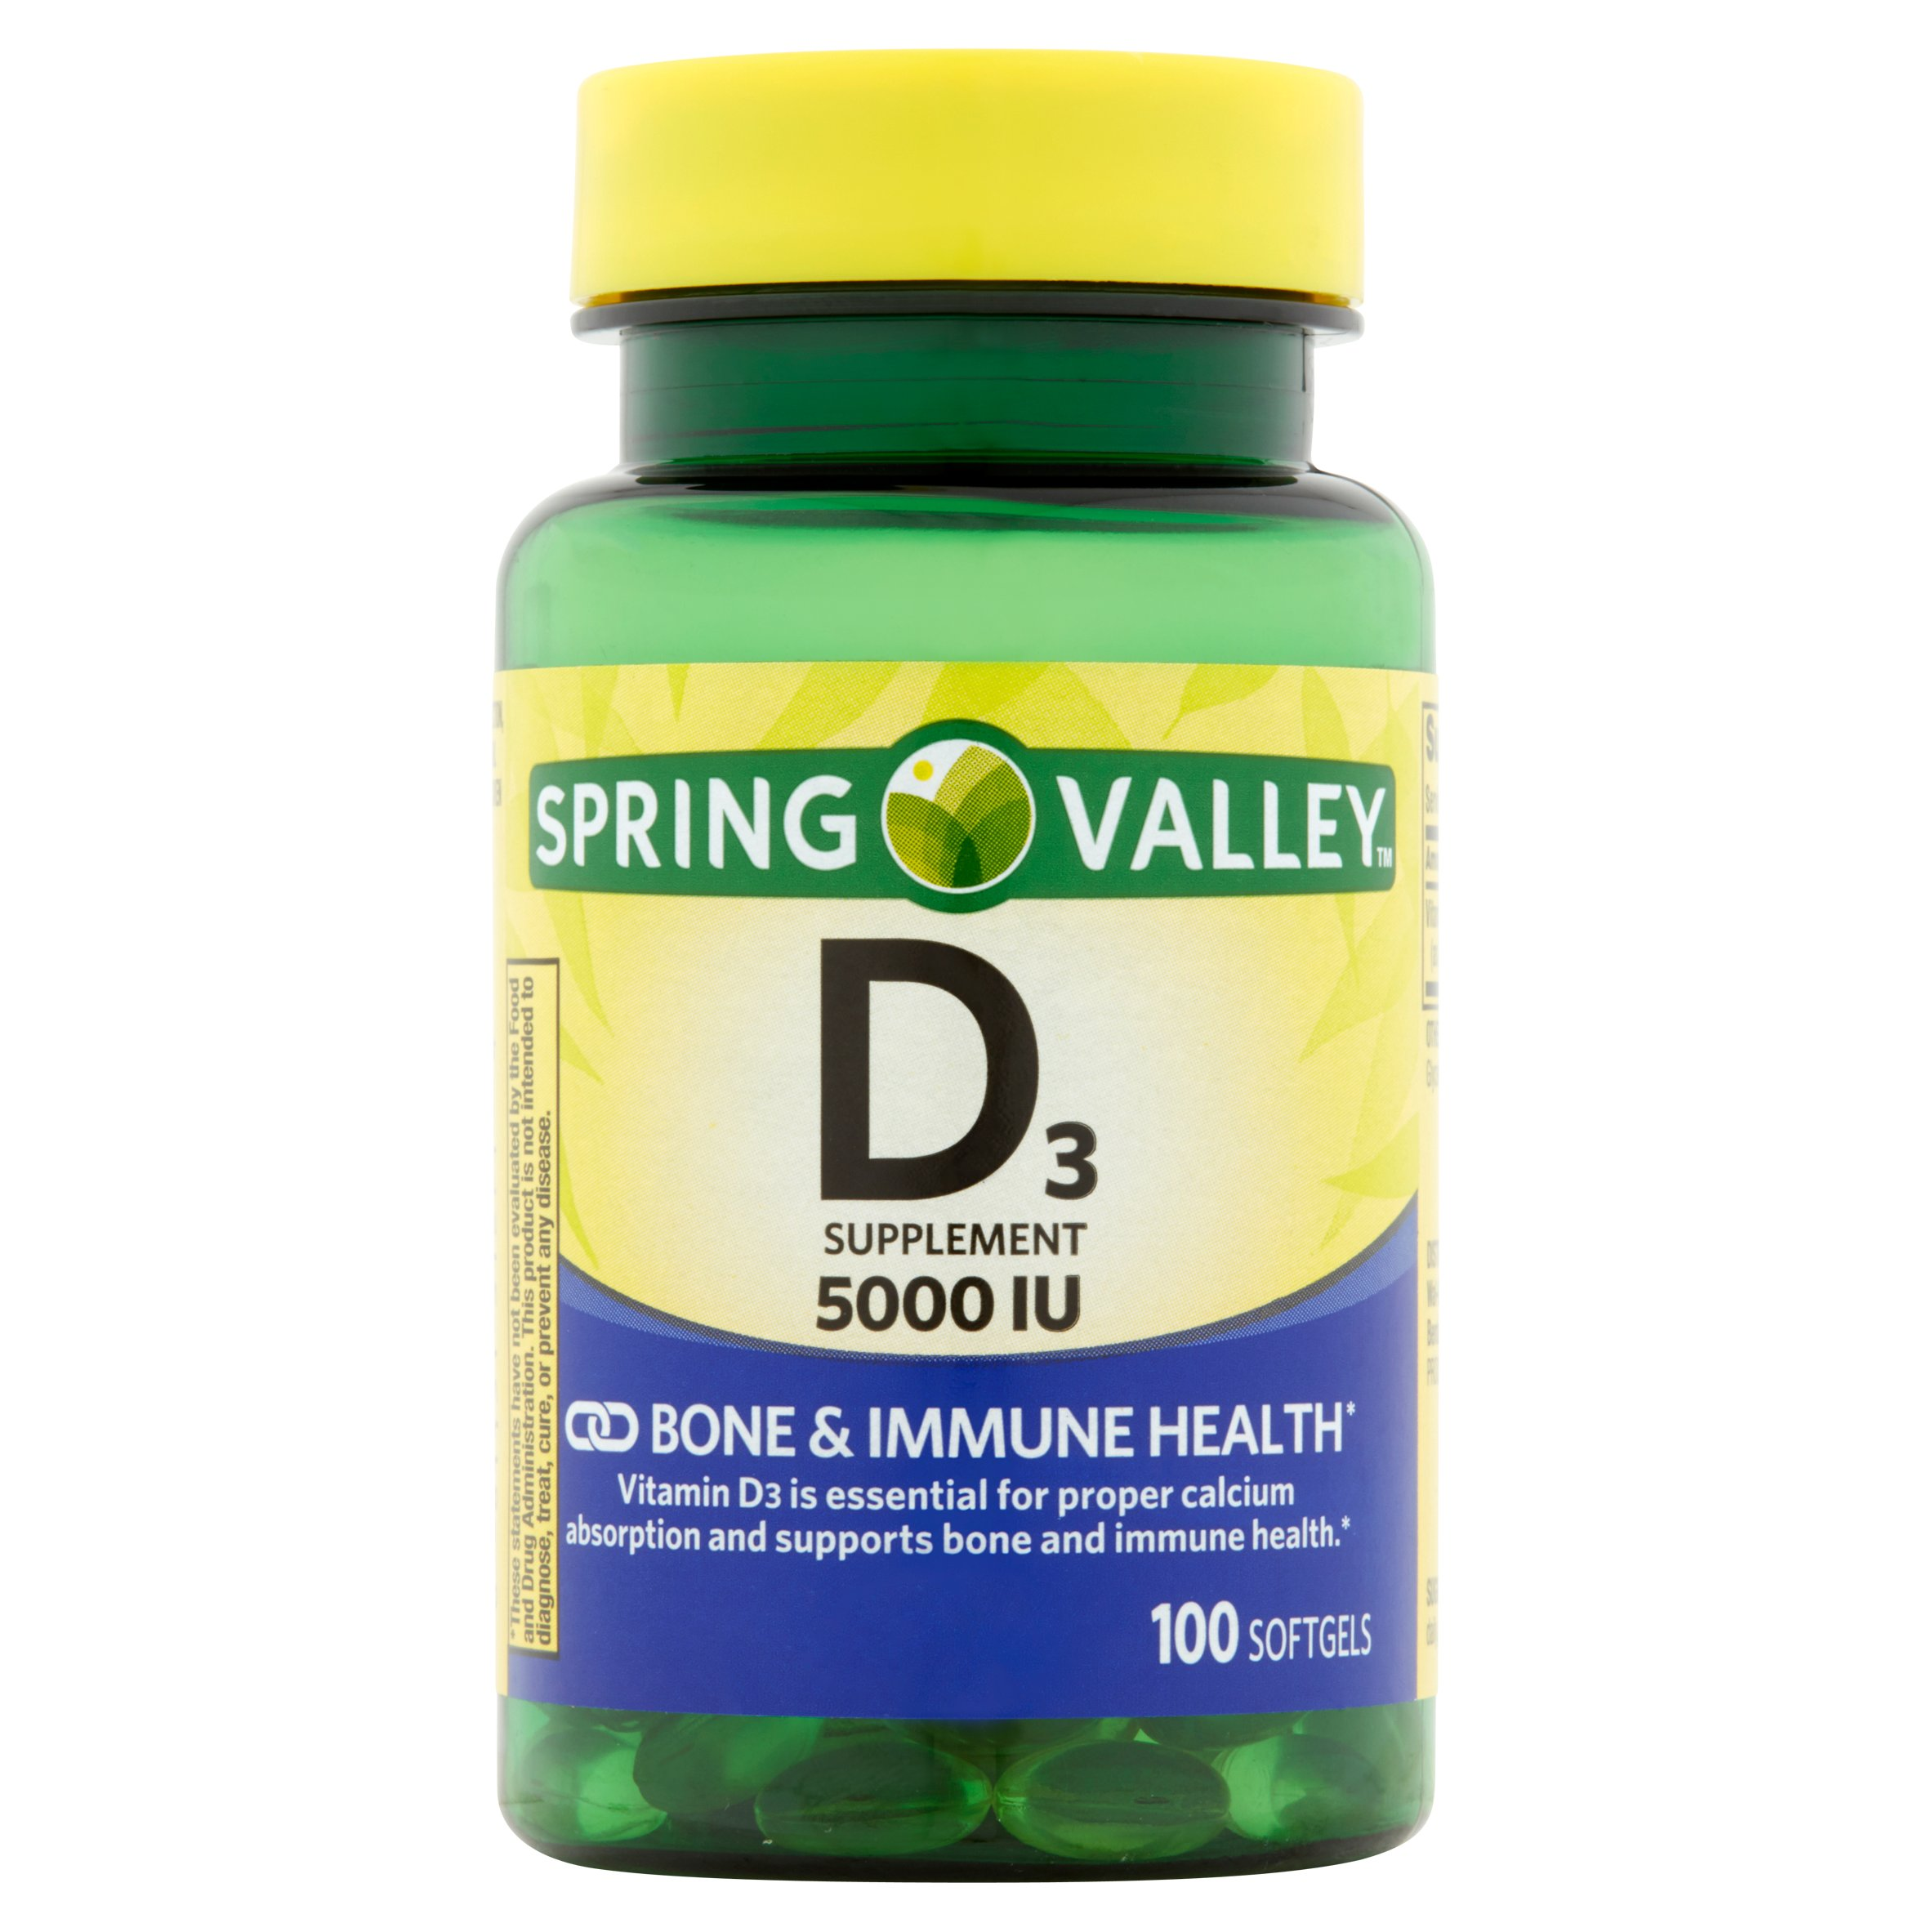 Spring Valley Vitamin D3 Softgels, 125 mcg (5000 IU), 100 Ct